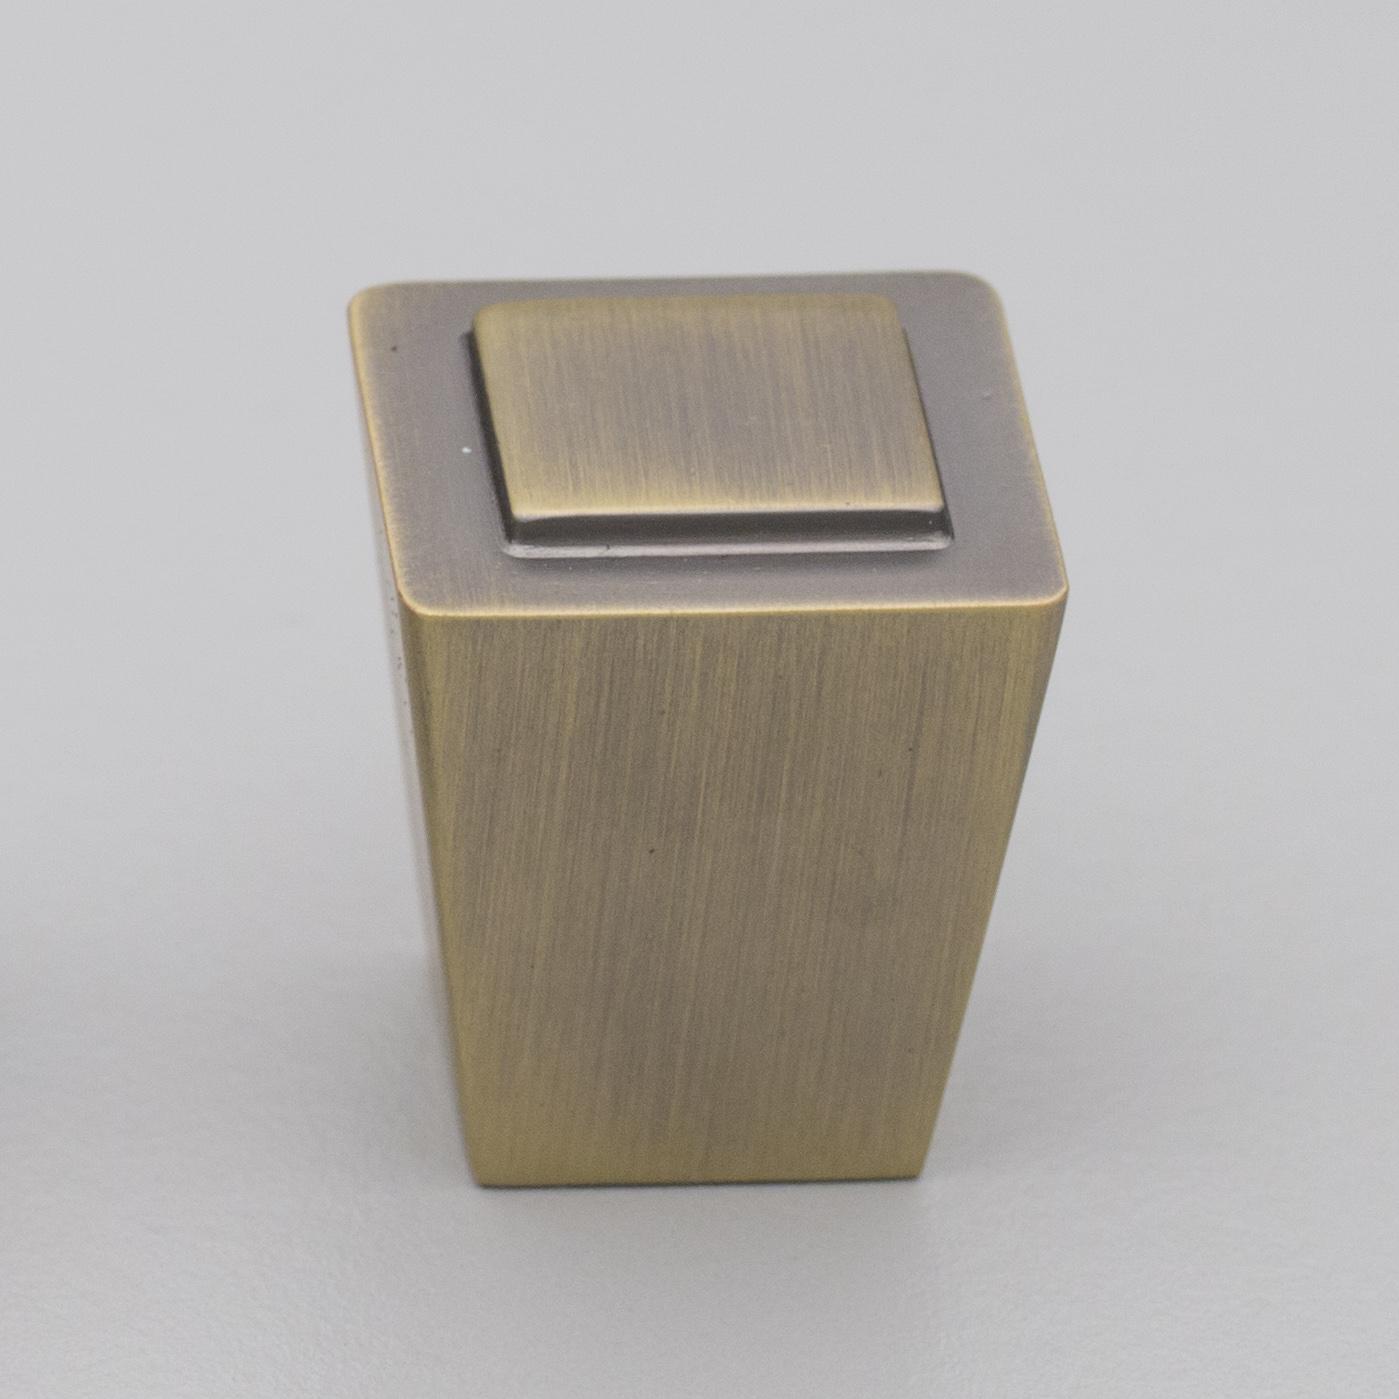 HT346 Antique Brass Square Knob Shaker